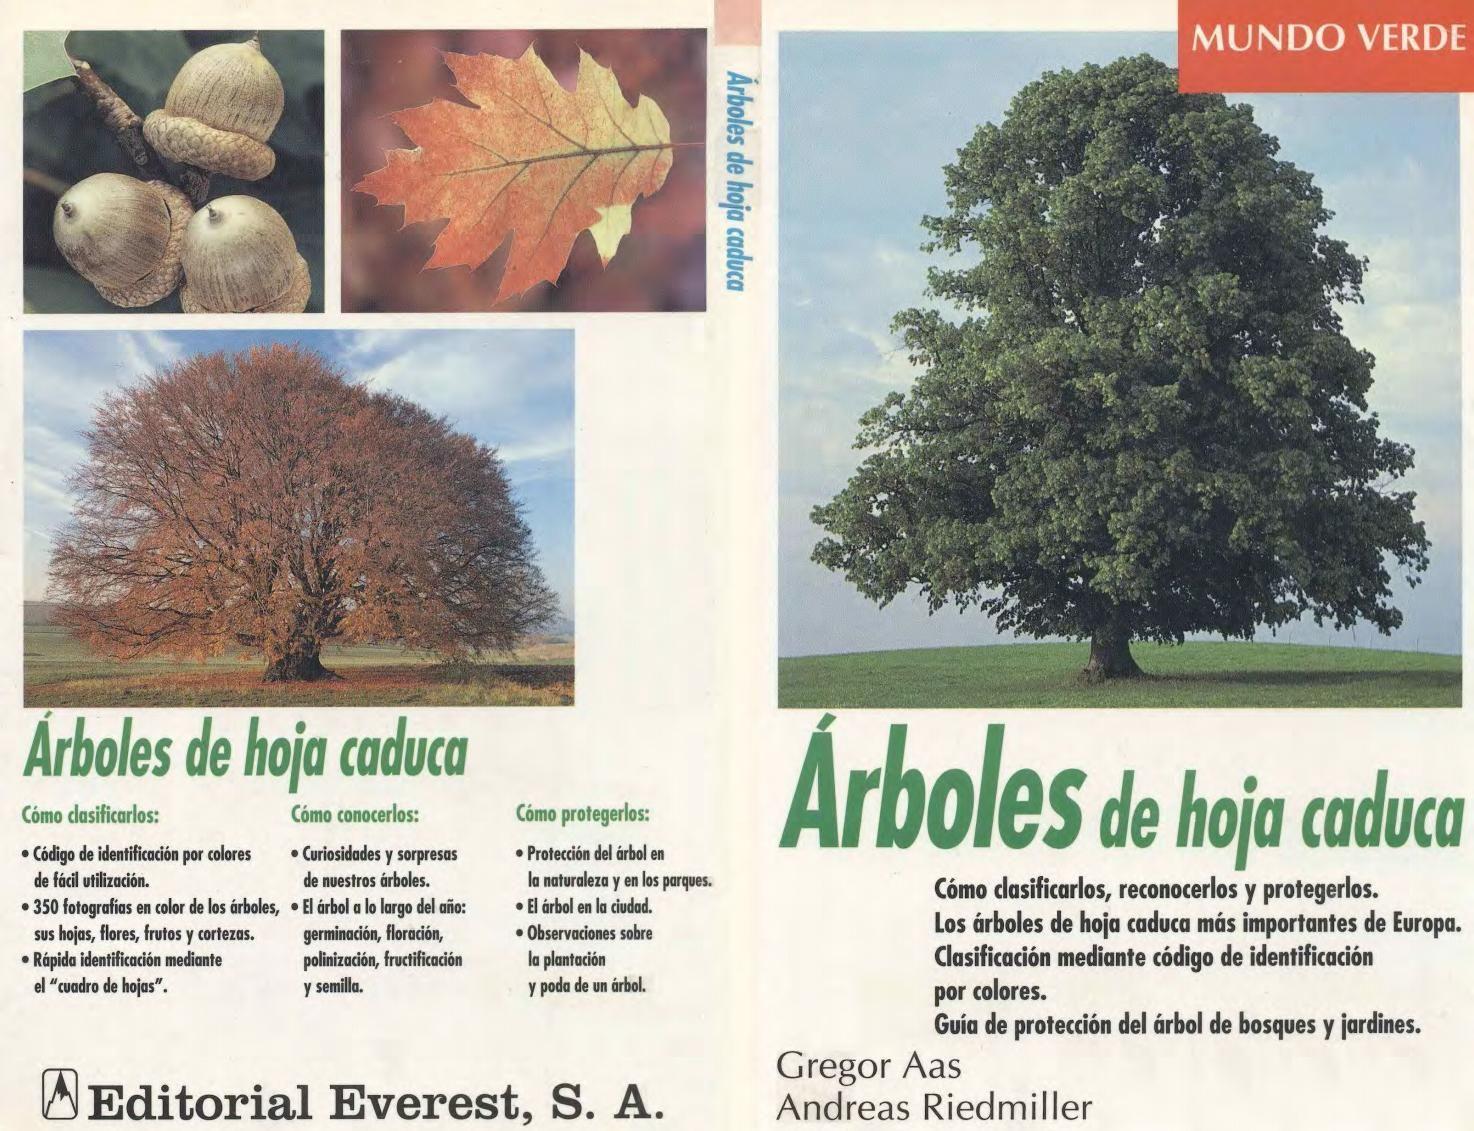 Everest arboles de hoja caduca libros de jardineria for Arboles de hoja perenne para ninos